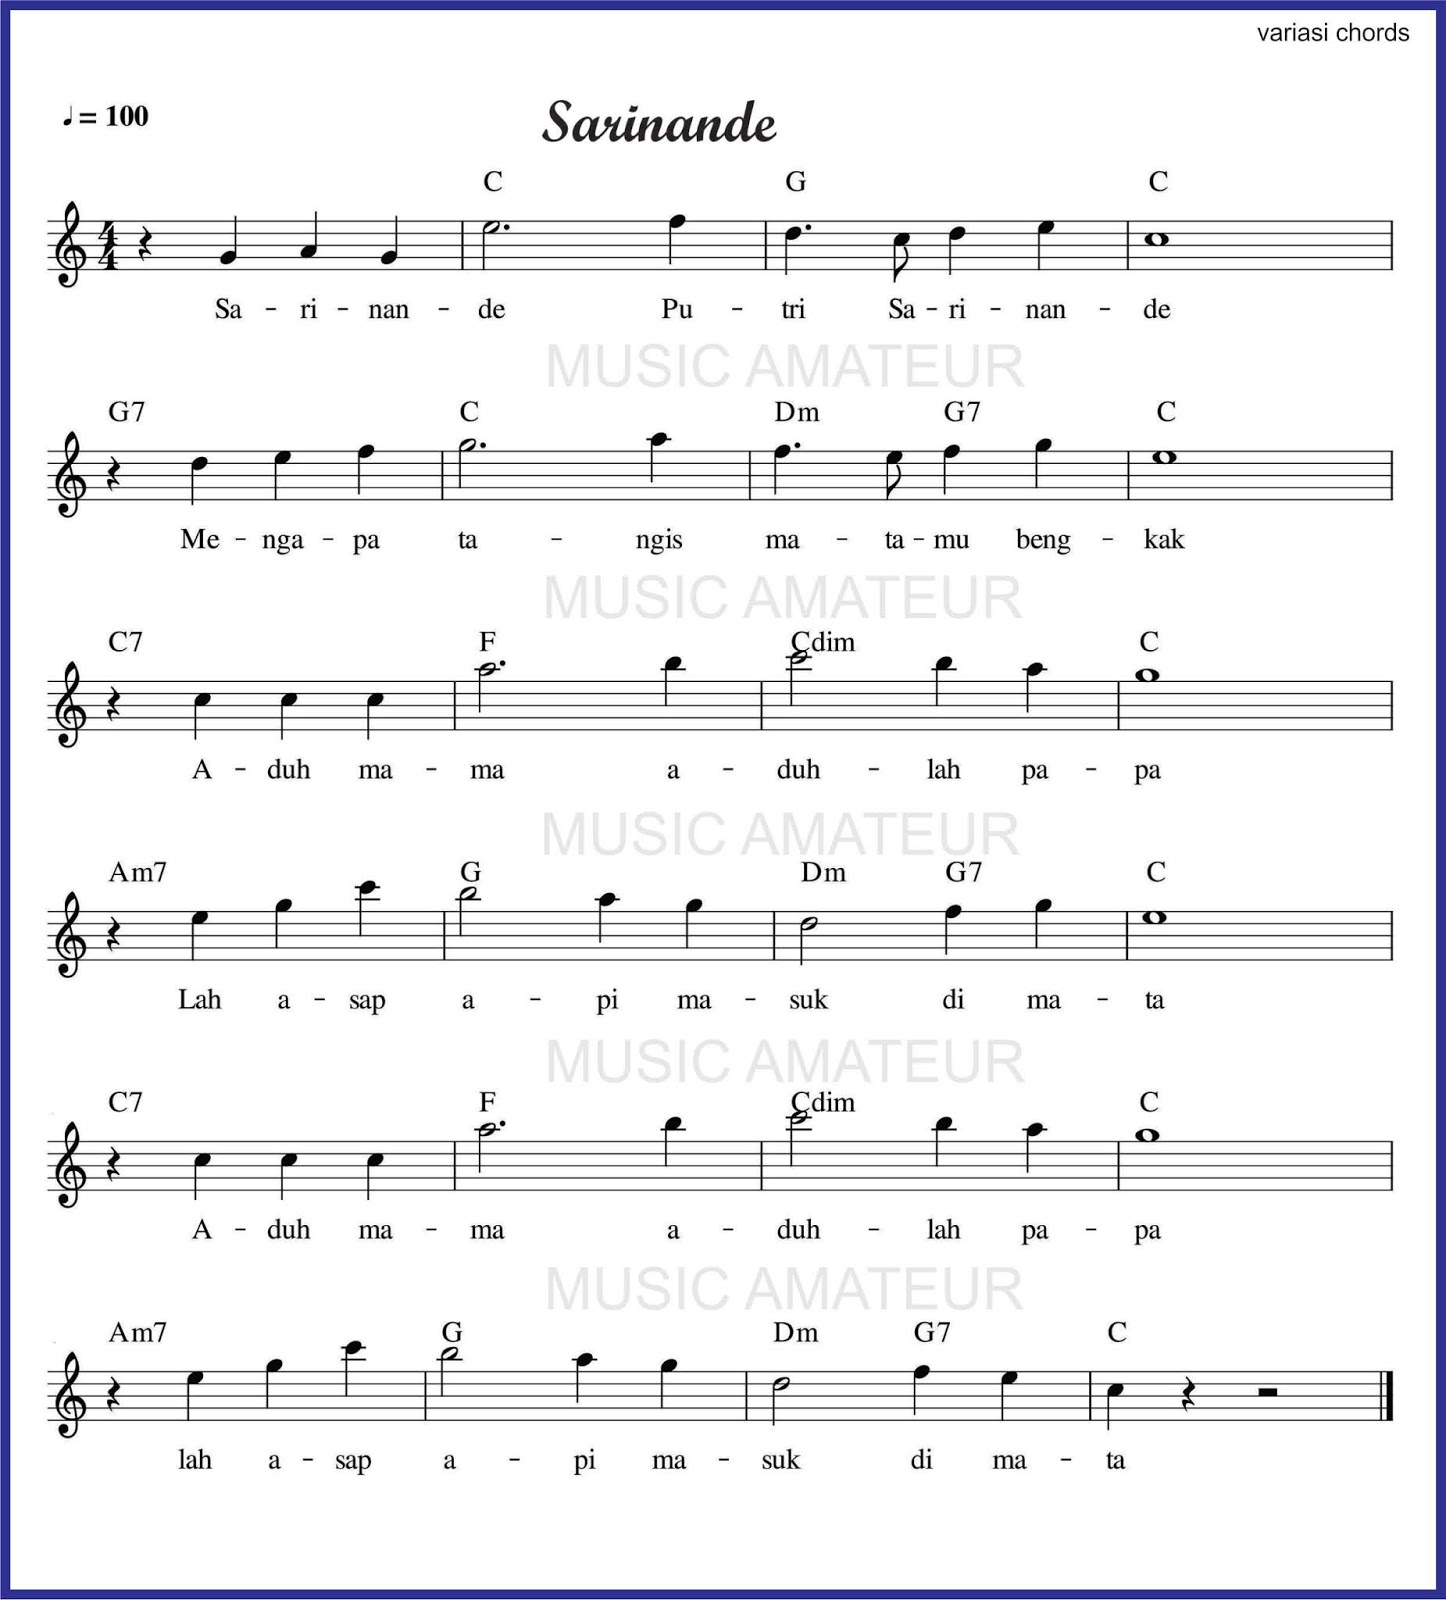 Mencari Akor / Chords Lagu Part 2 - SEPUTAR MUSIK